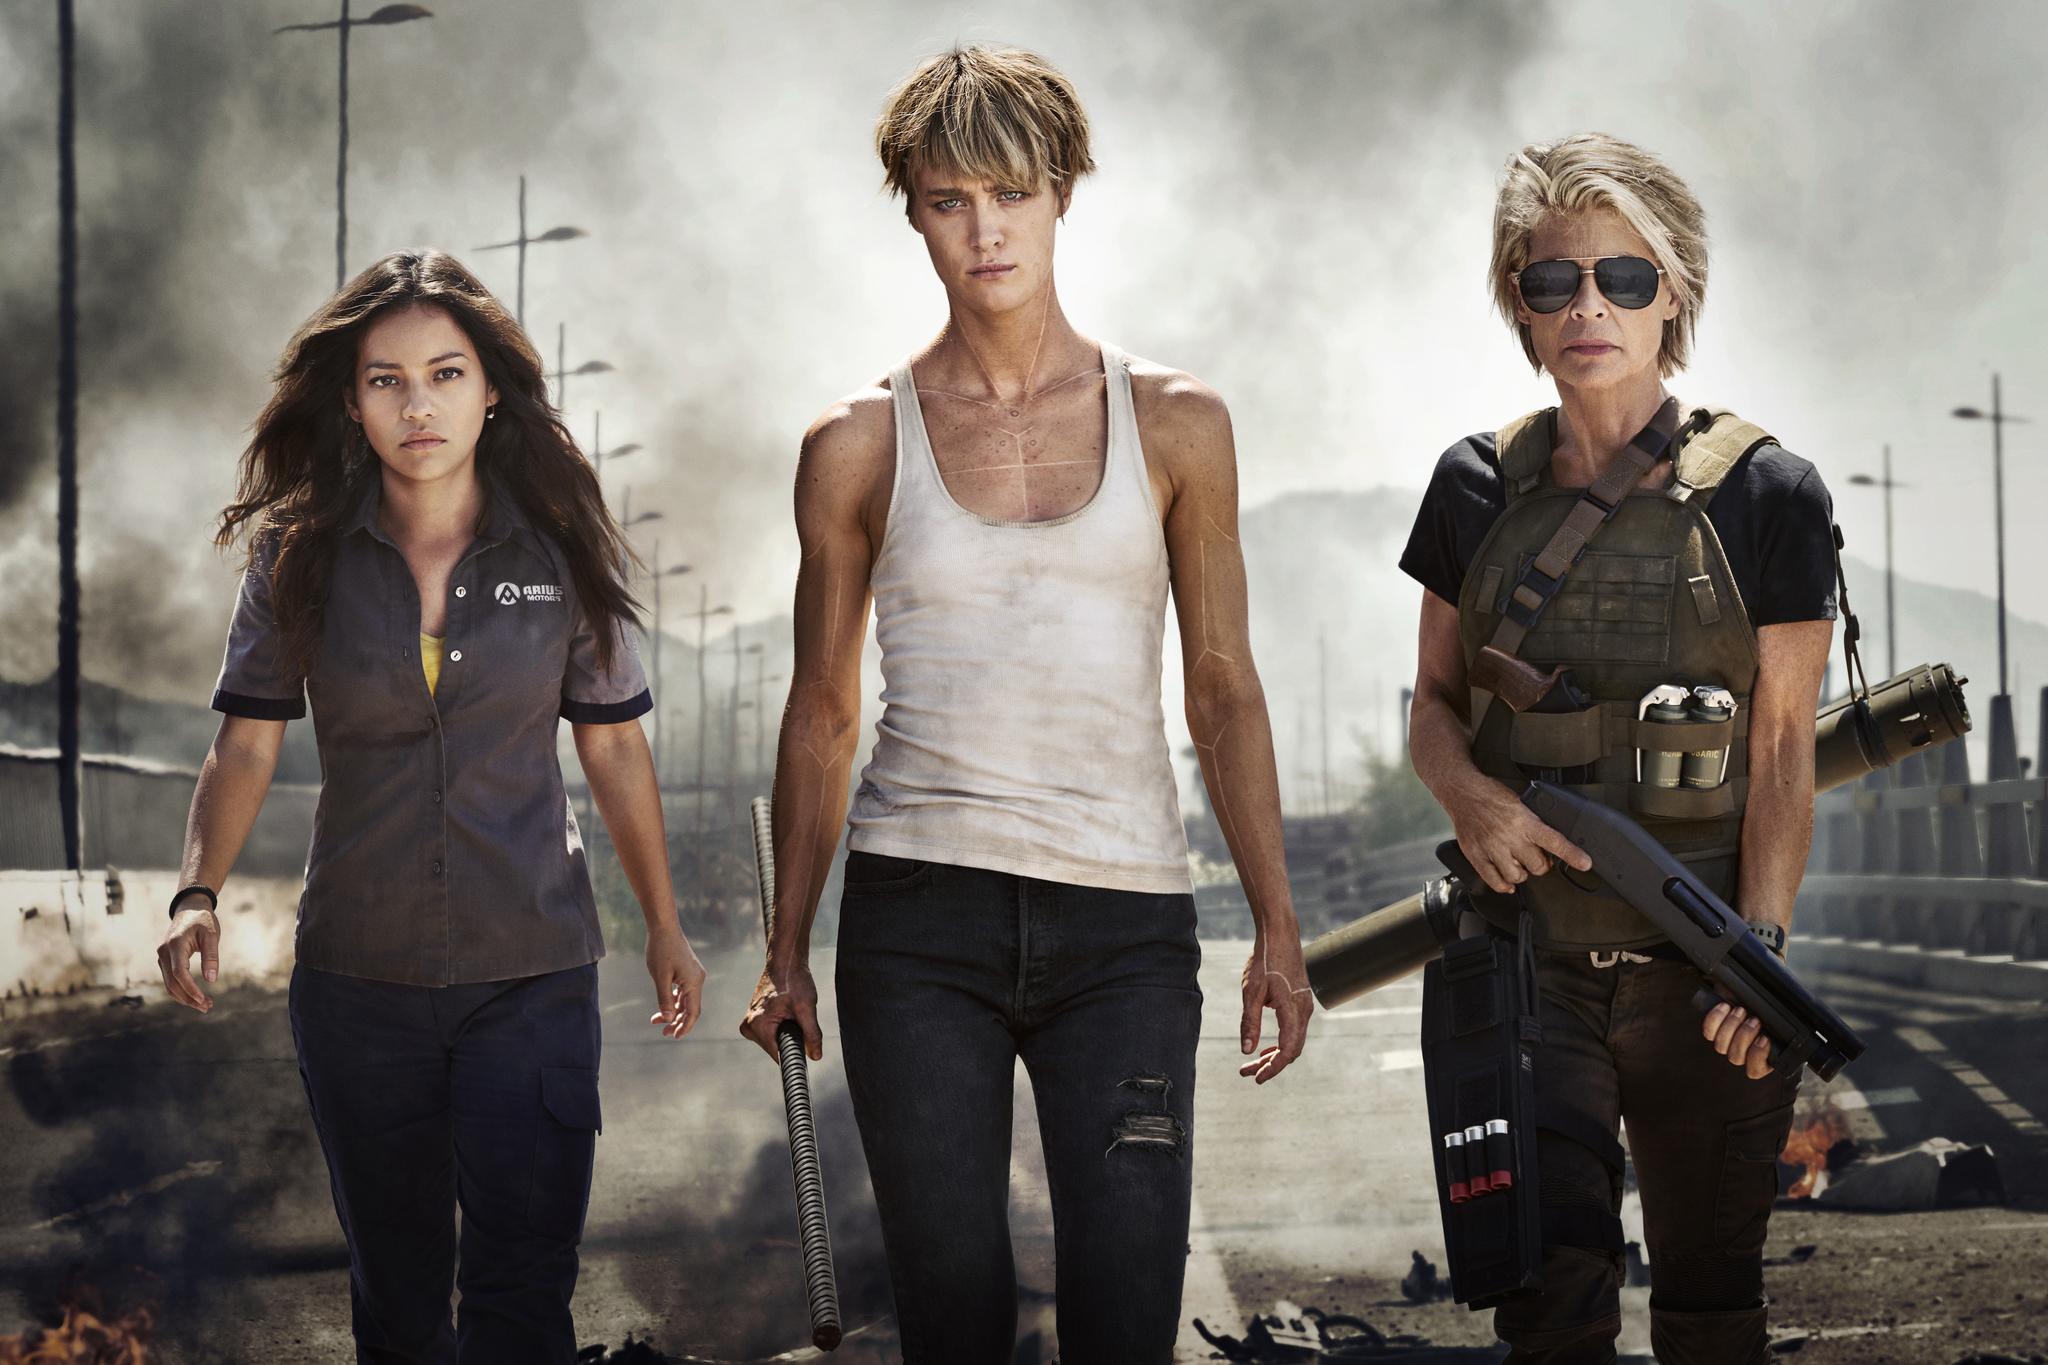 Photography: Terminator: Dark Fate